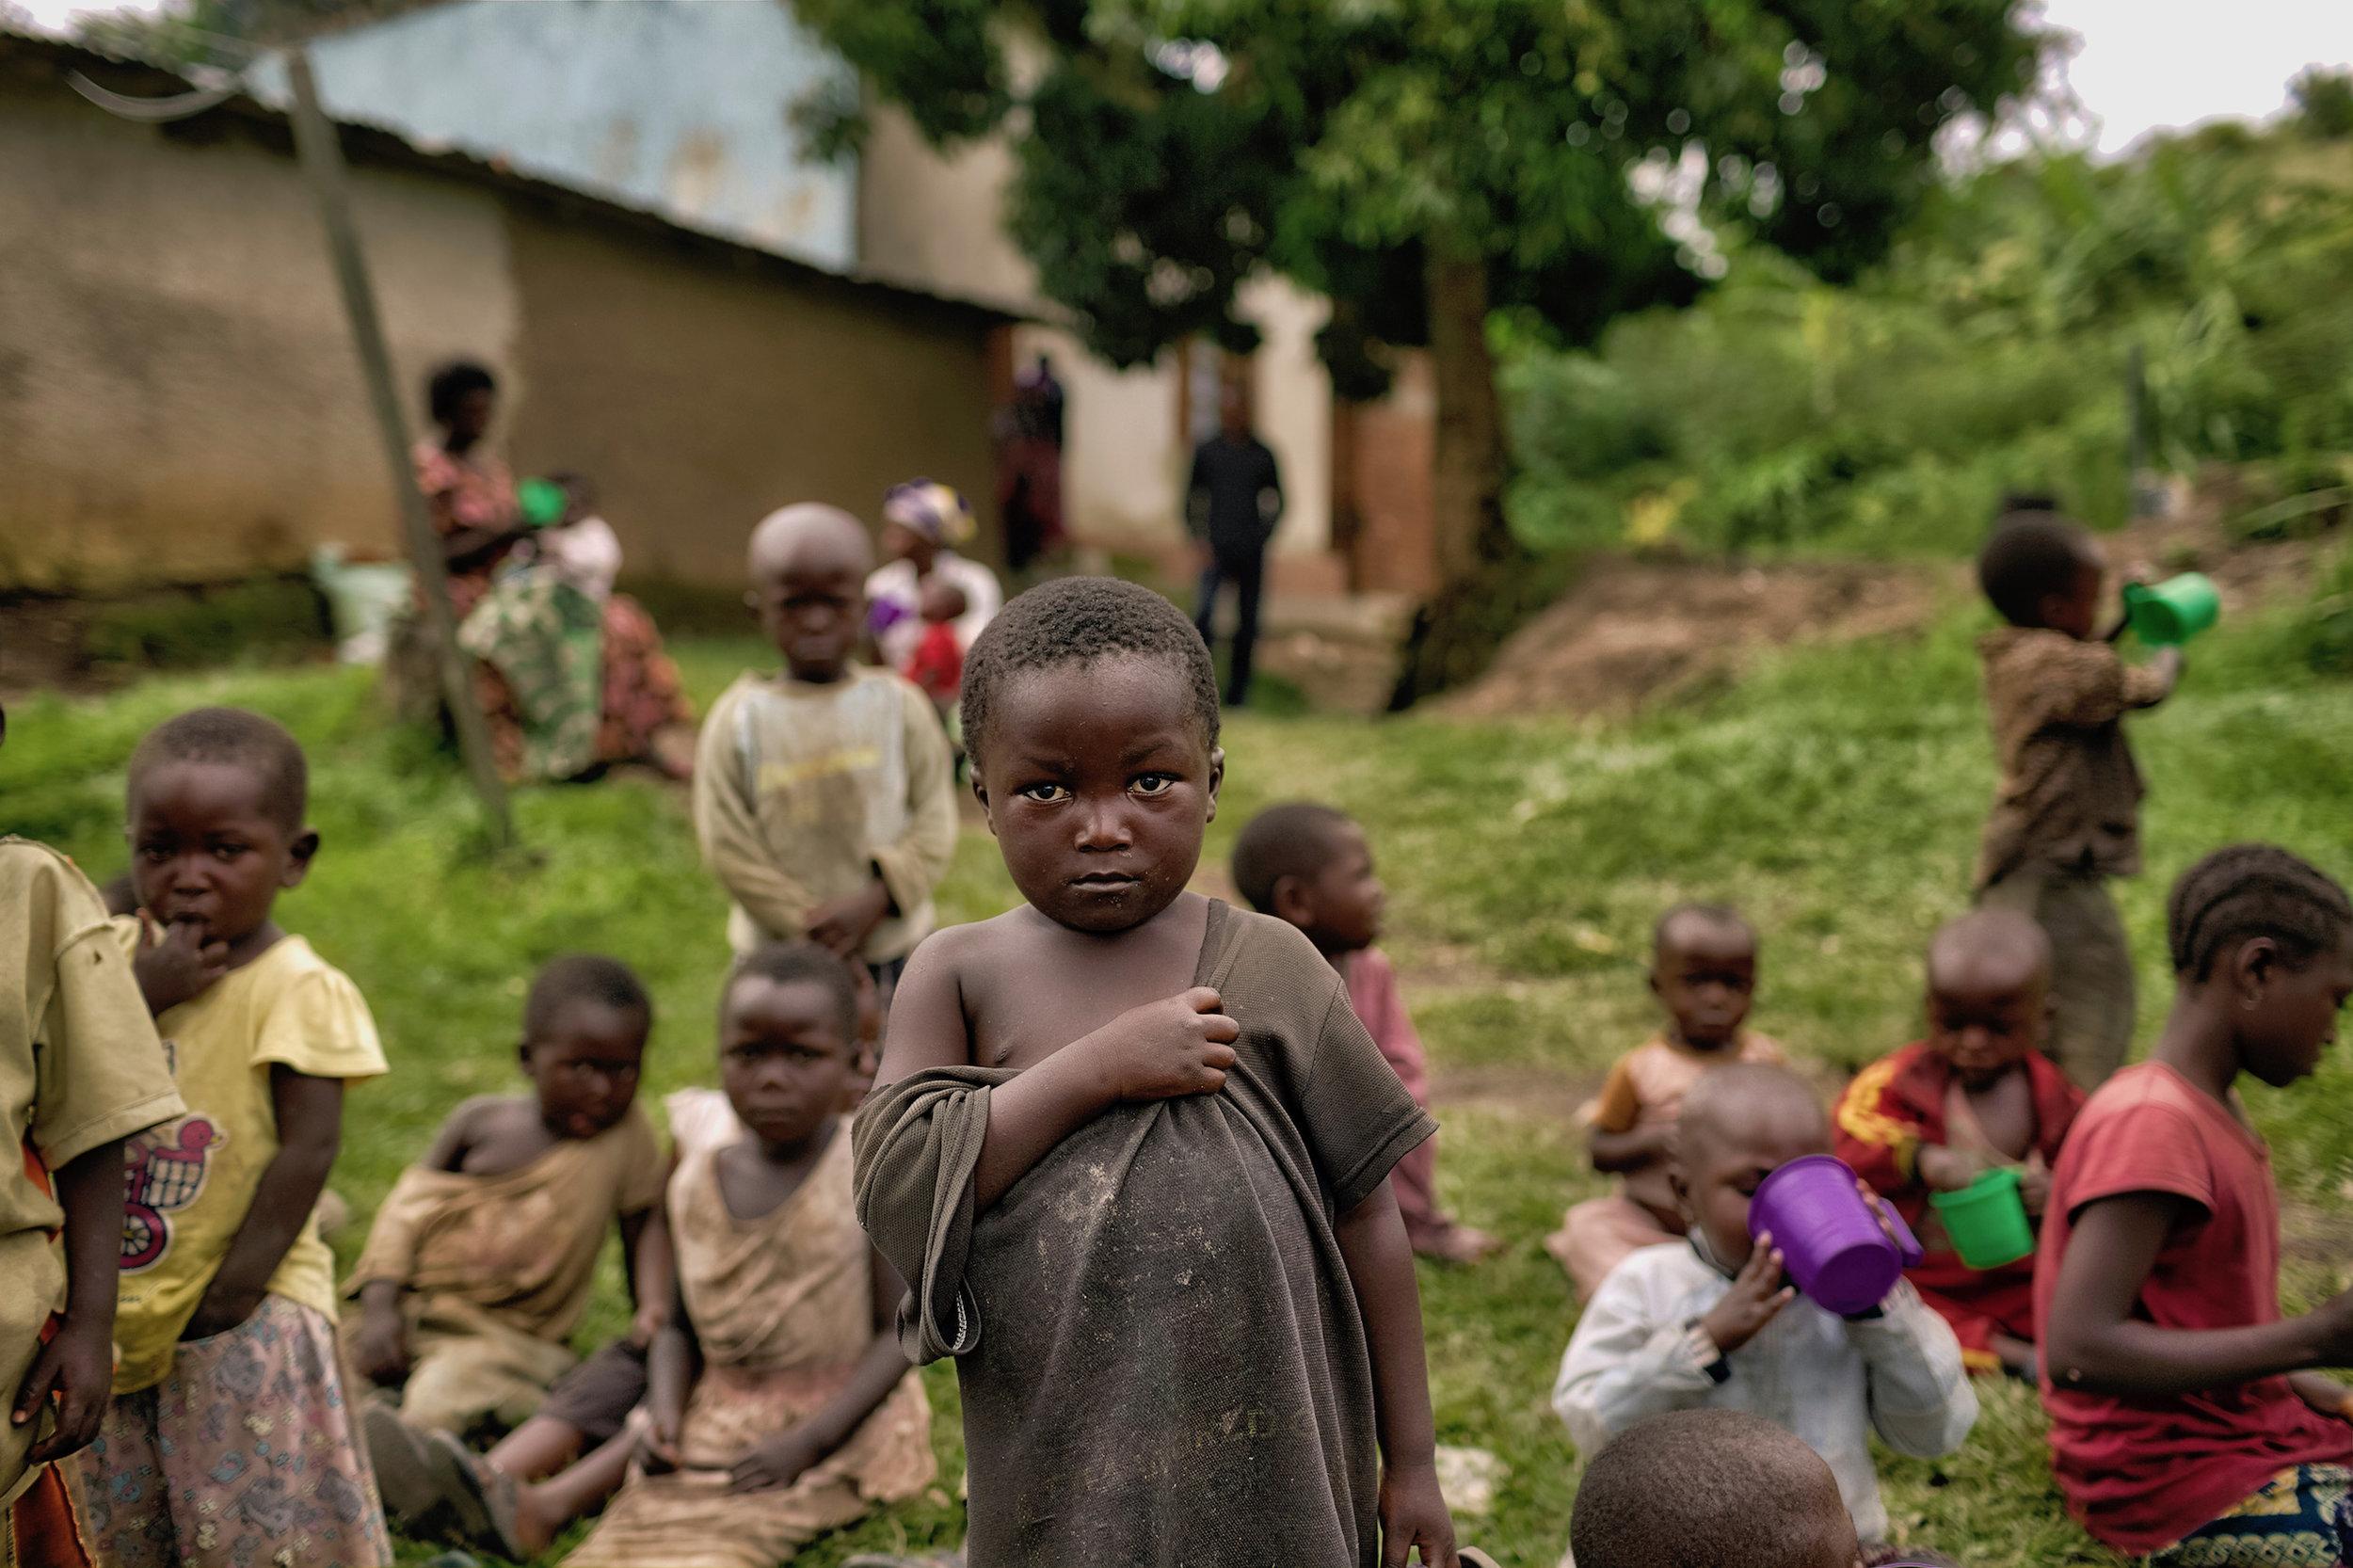 saskia-keeley-photography-humanitarian-photojournalism-055A1636-6_boy-face_retouched.jpg